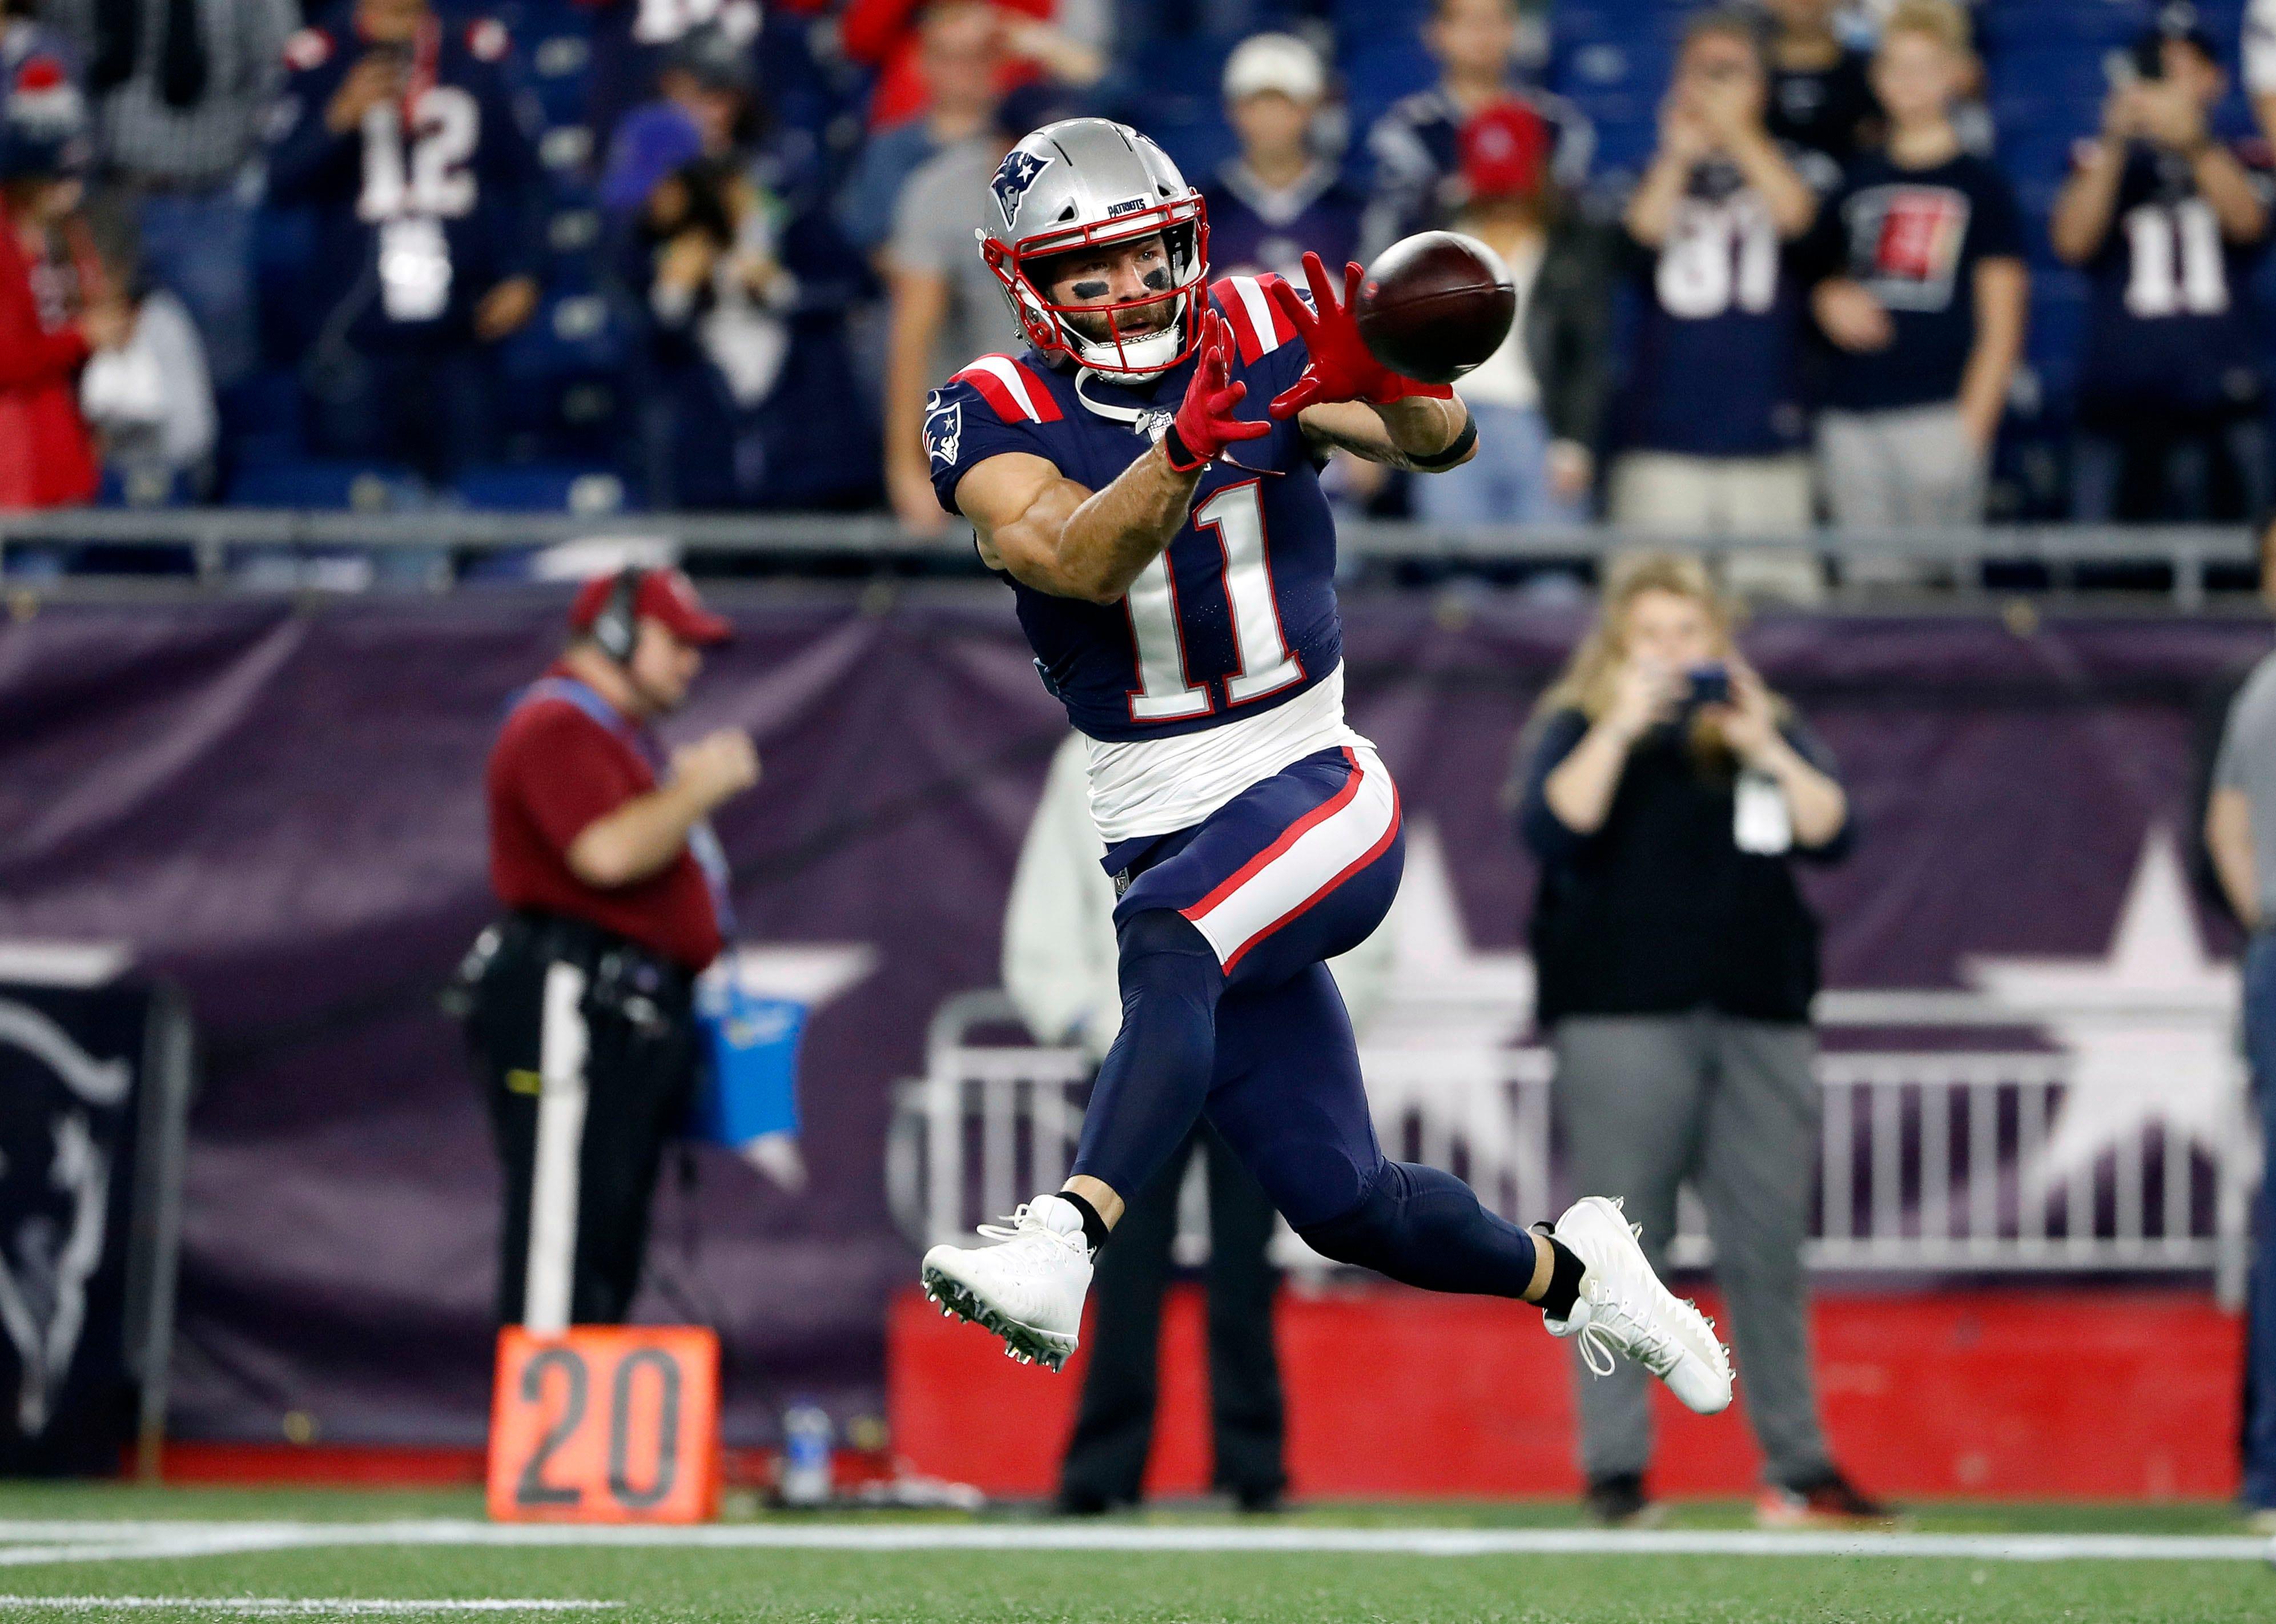 Julian Edelman returns, Tom Brady gets milestone as Patriots cruise past Colts